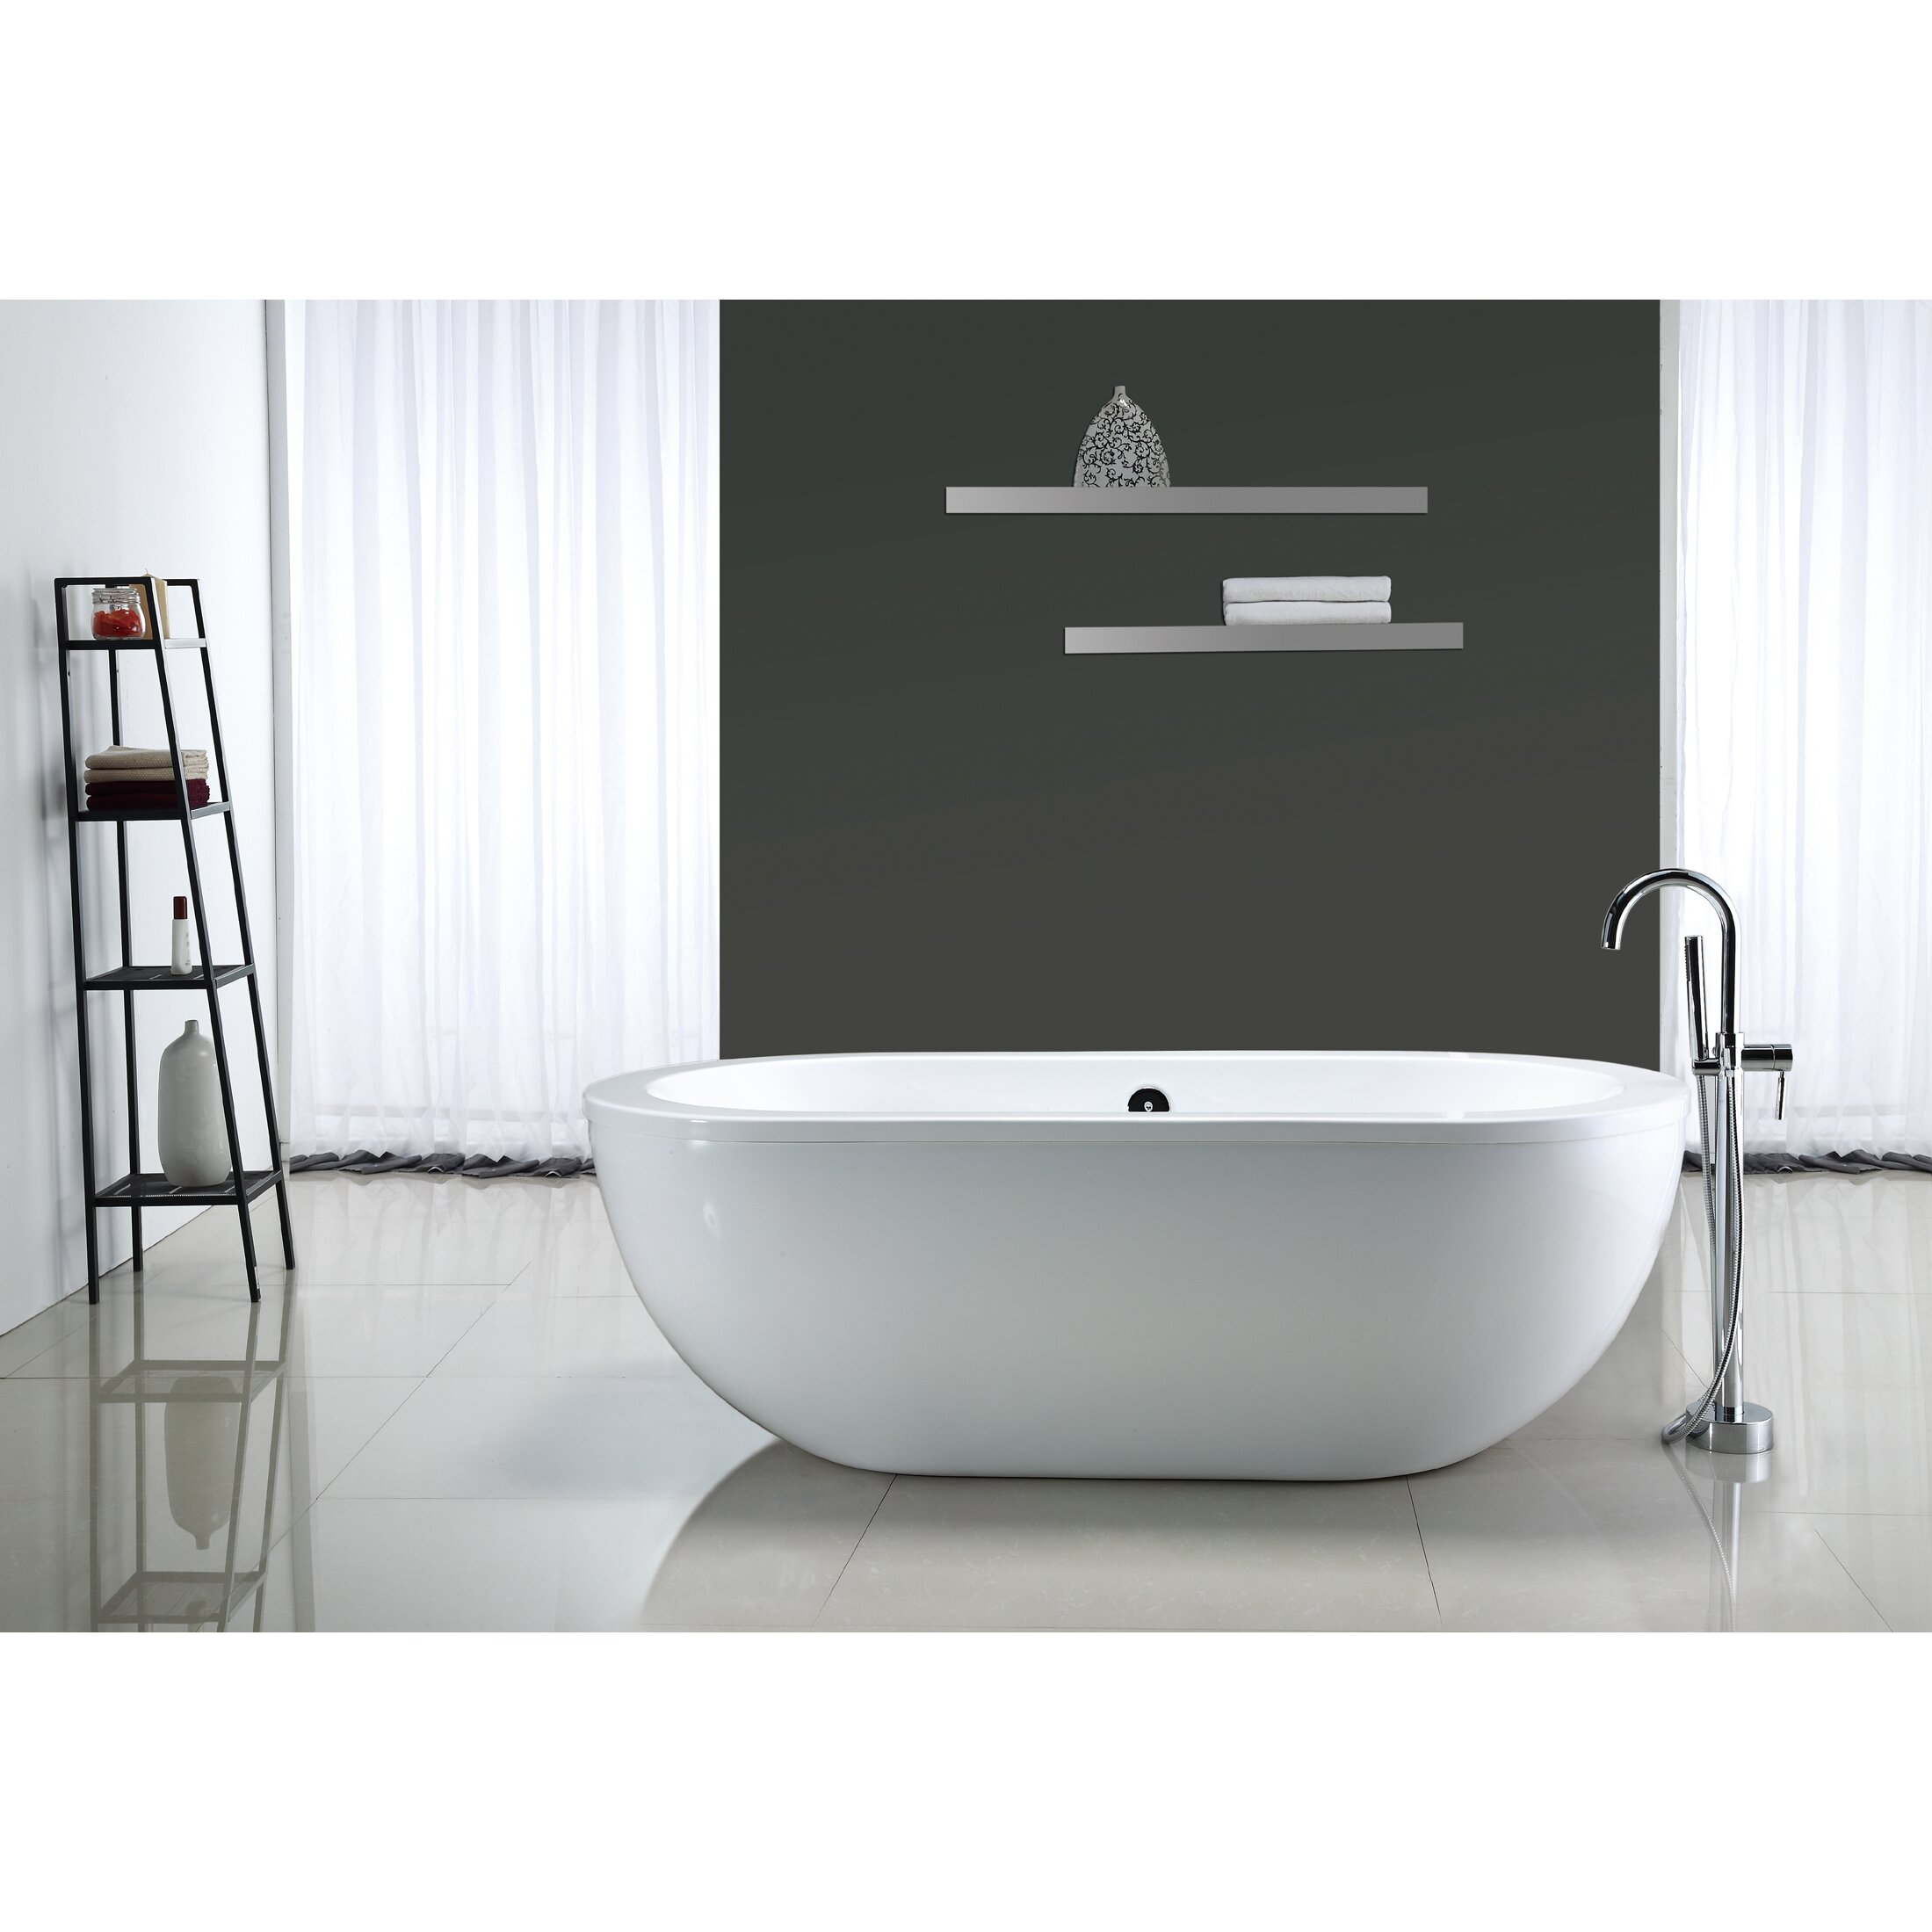 "Freestanding Bathtub: Ove Decors Serenity 71"" X 34"" Acrylic Freestanding Bathtub"